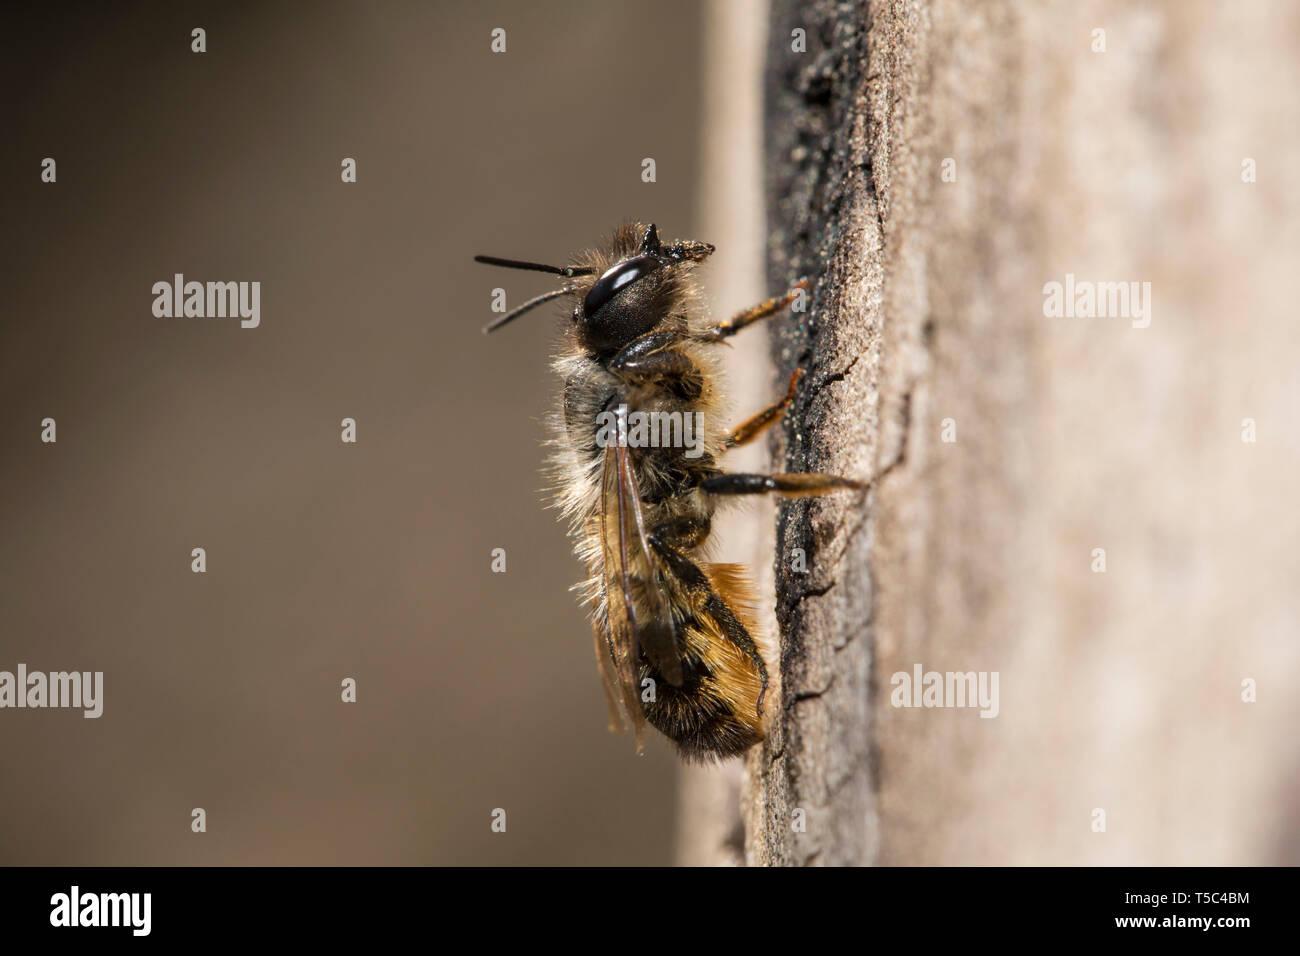 Mauerbiene, Osmia, Mason bee - Stock Image